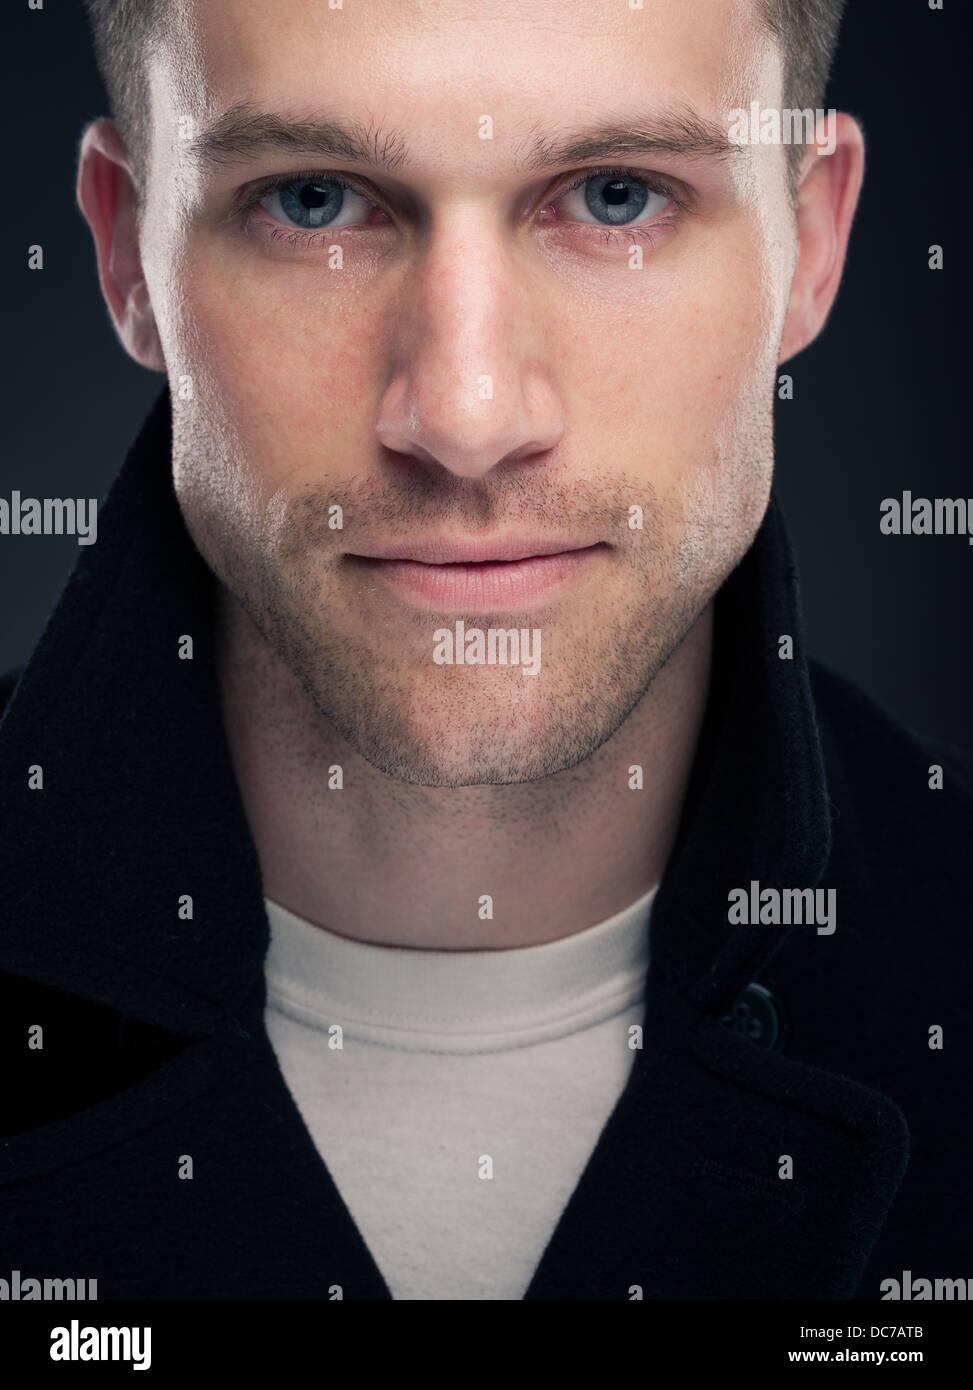 Handsome Caucasian man in white t-shirt and dark wool pea coat ( jacket ) - Stock Image